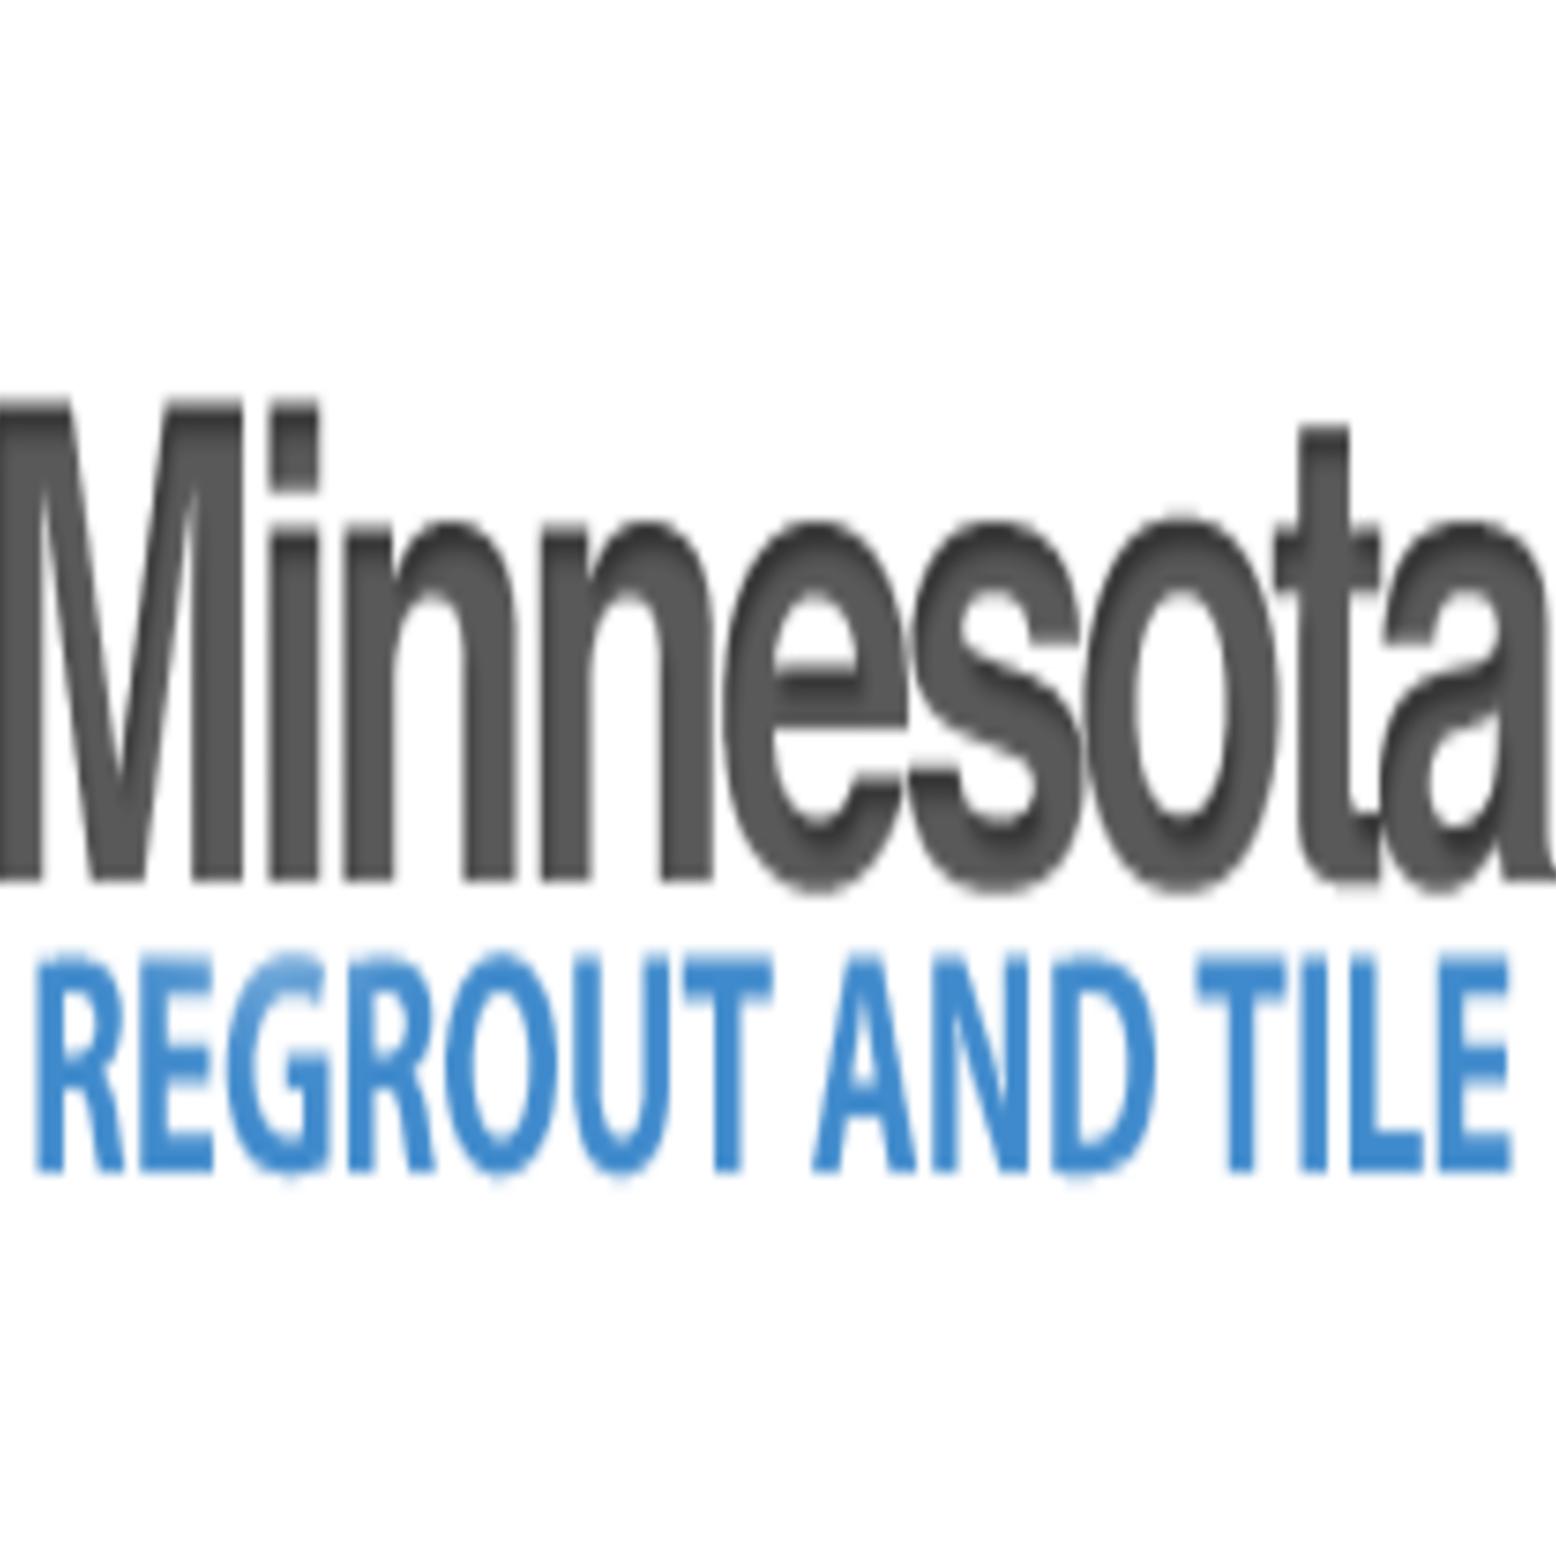 Minnesota Regrout & Tile Inc.